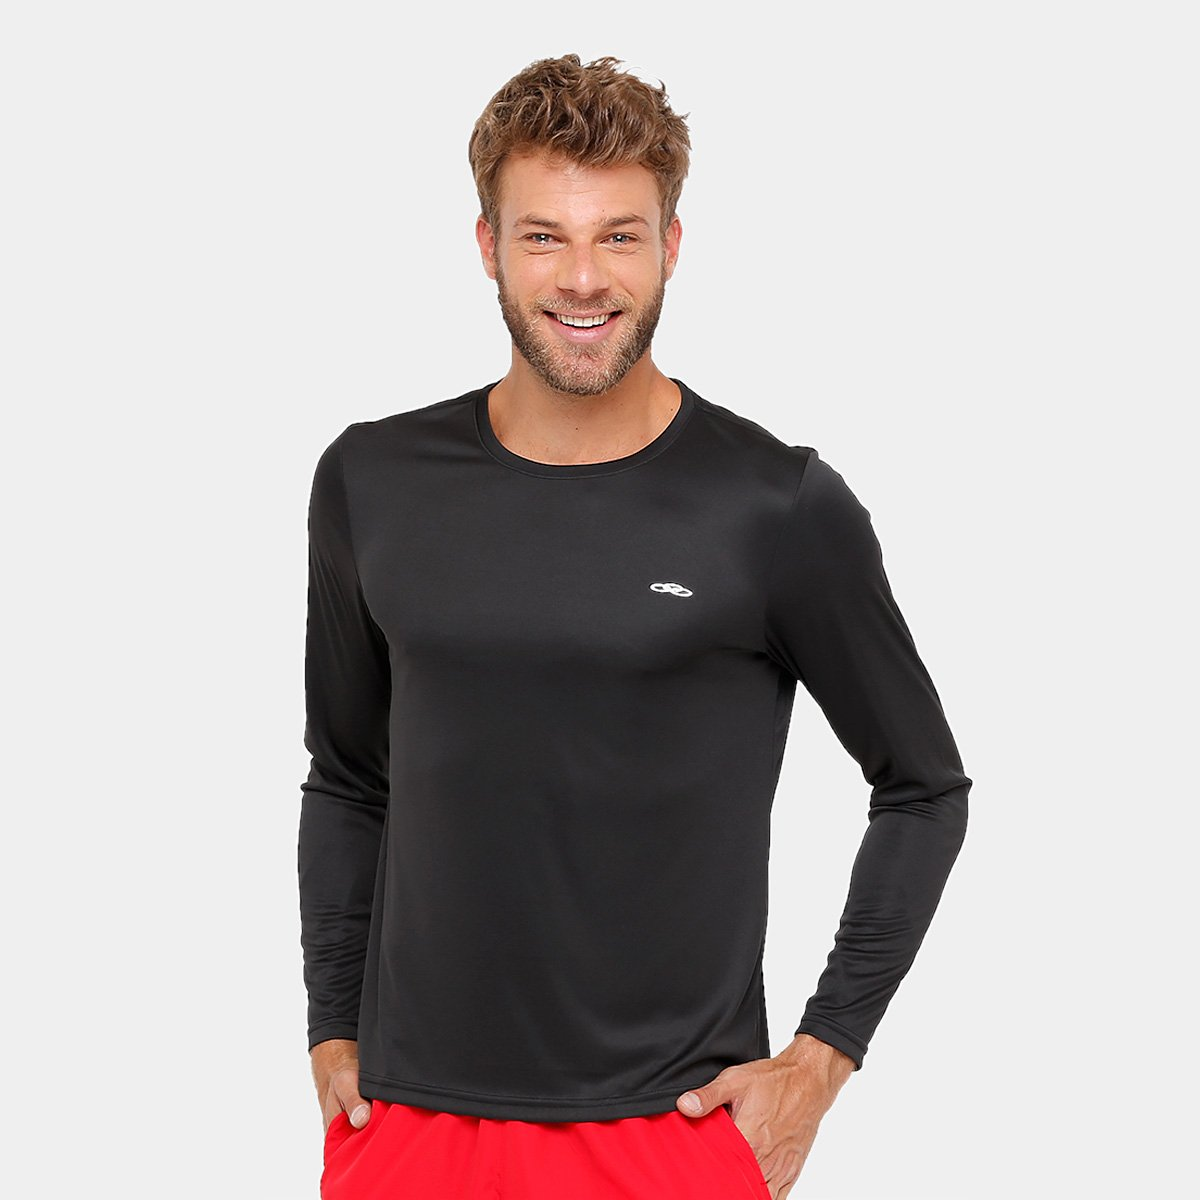 Camiseta Olympikus Essential Proteção UV 50+ Manga Longa Masculina ... e35b56fa9cf59